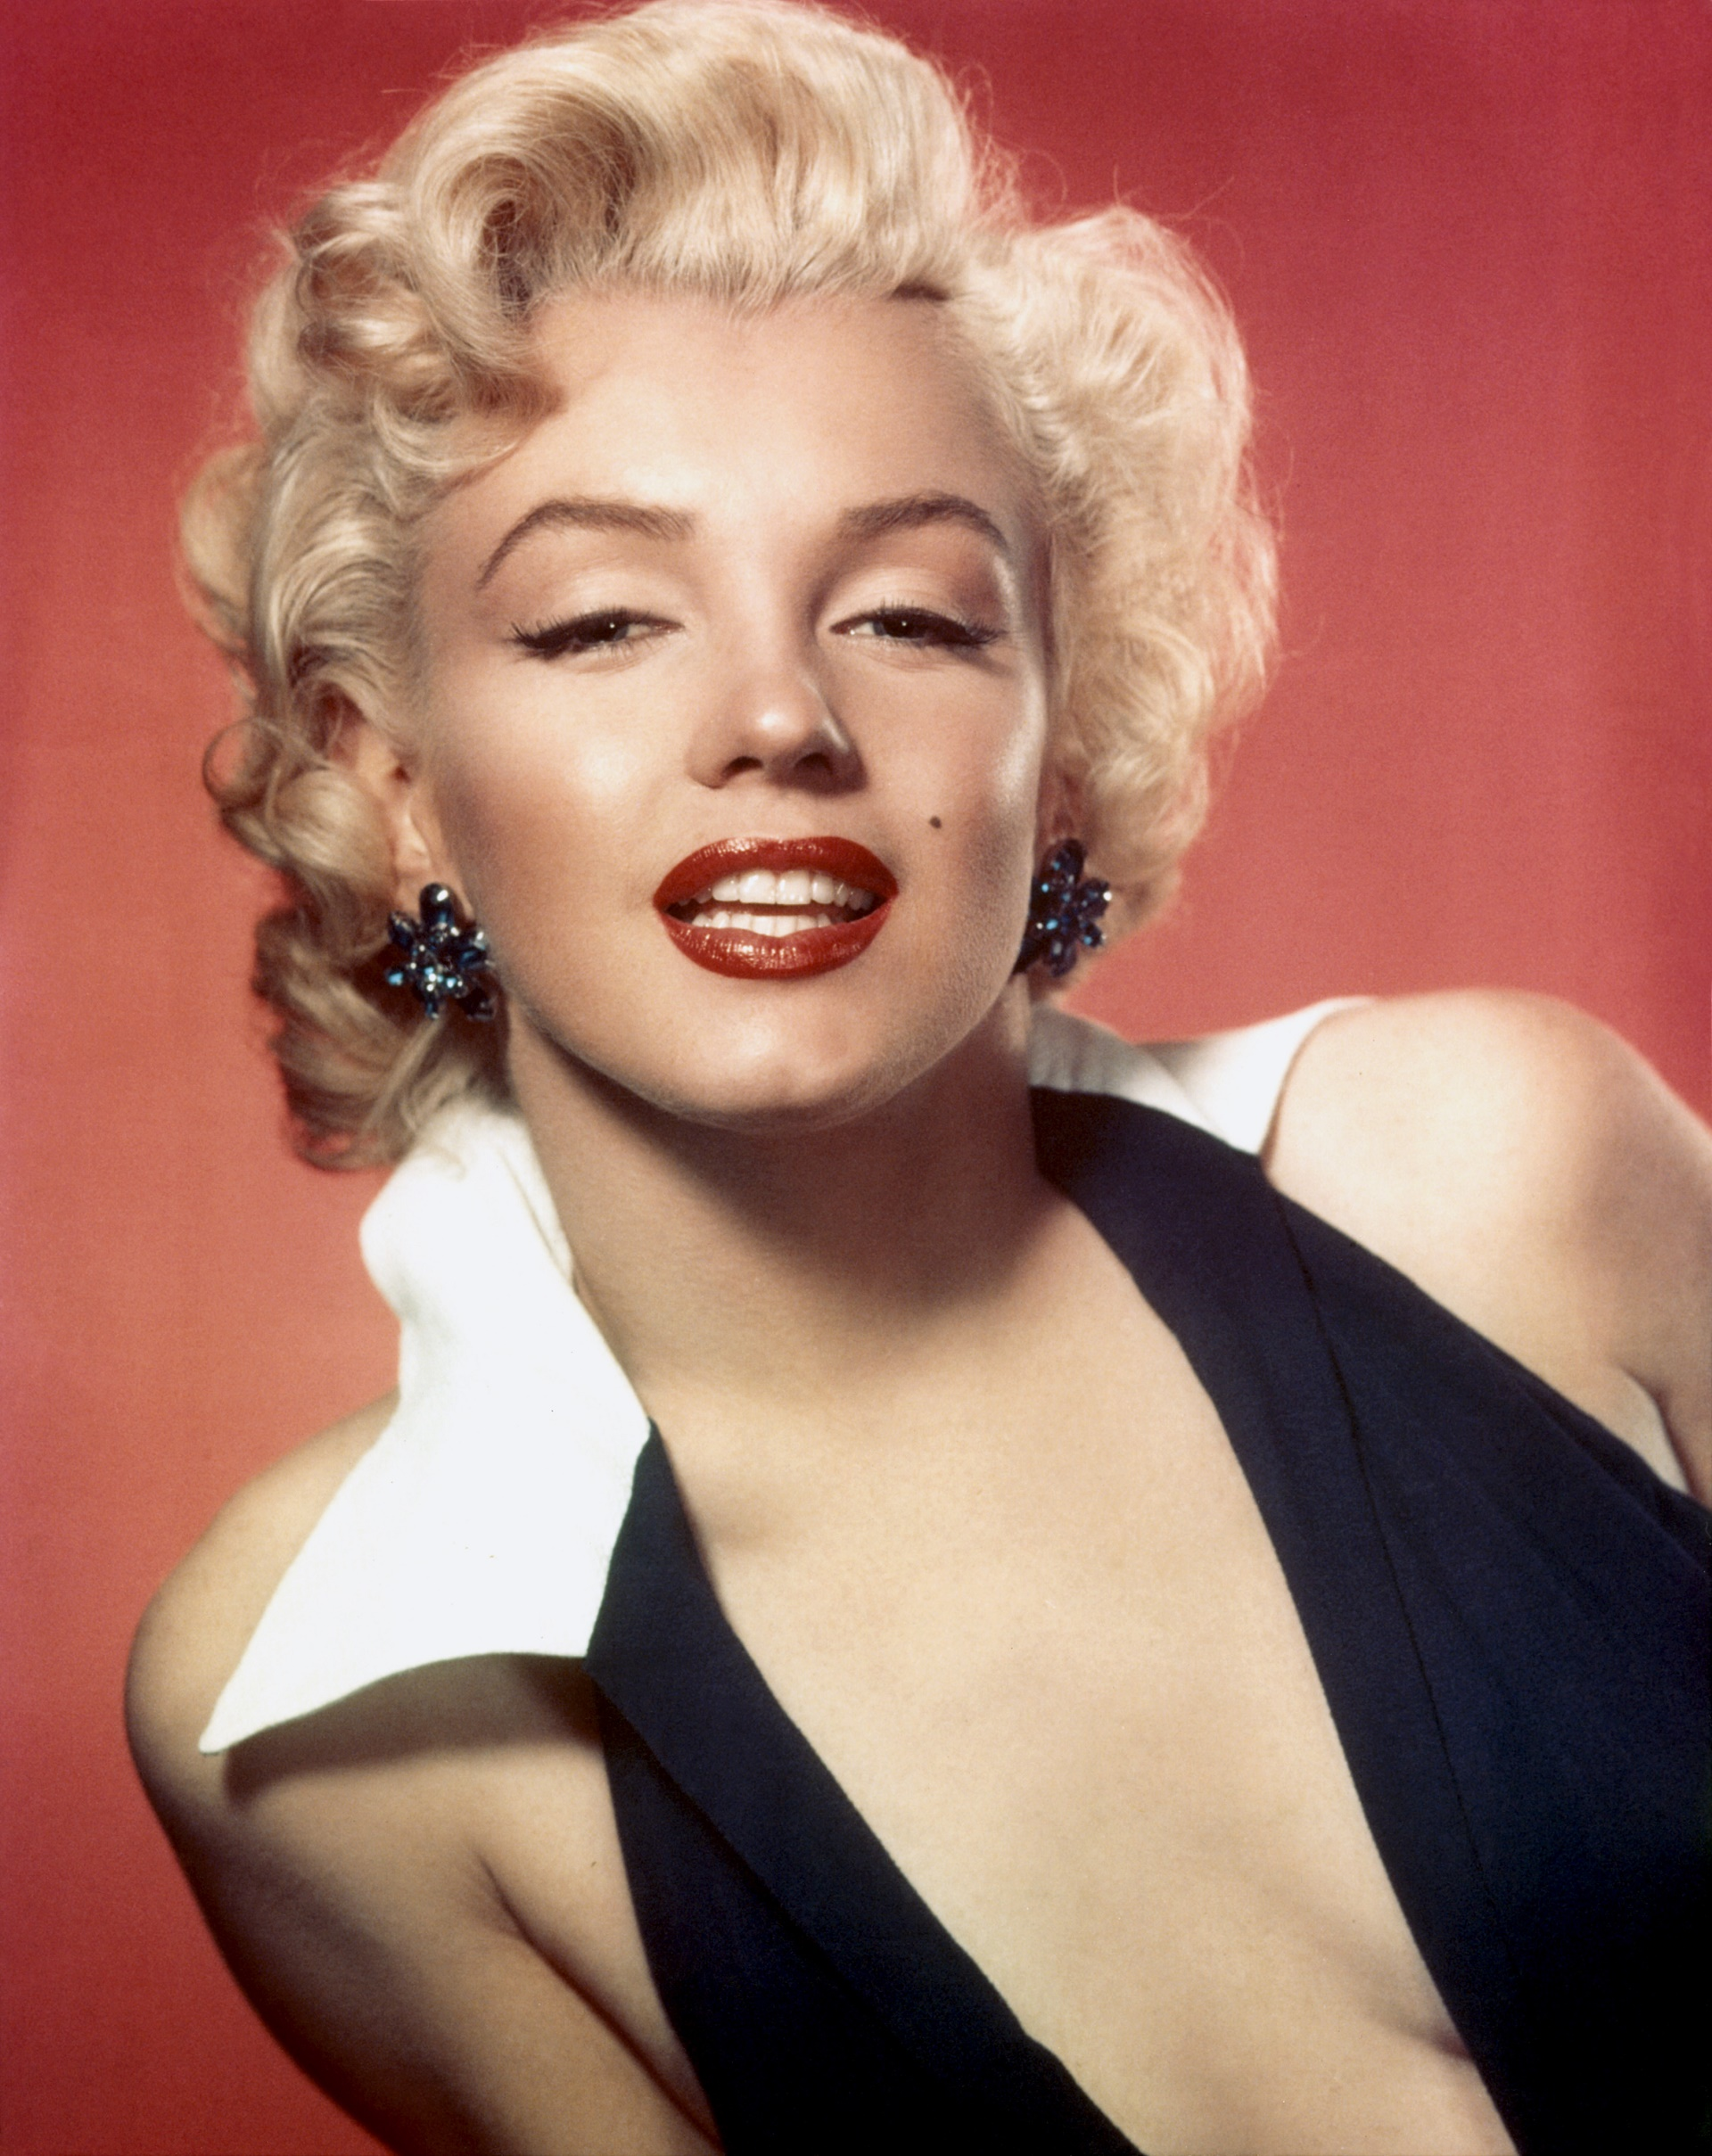 Citaten Marilyn Monroe Hd : Imágenes de marilyn monroe fotos hd